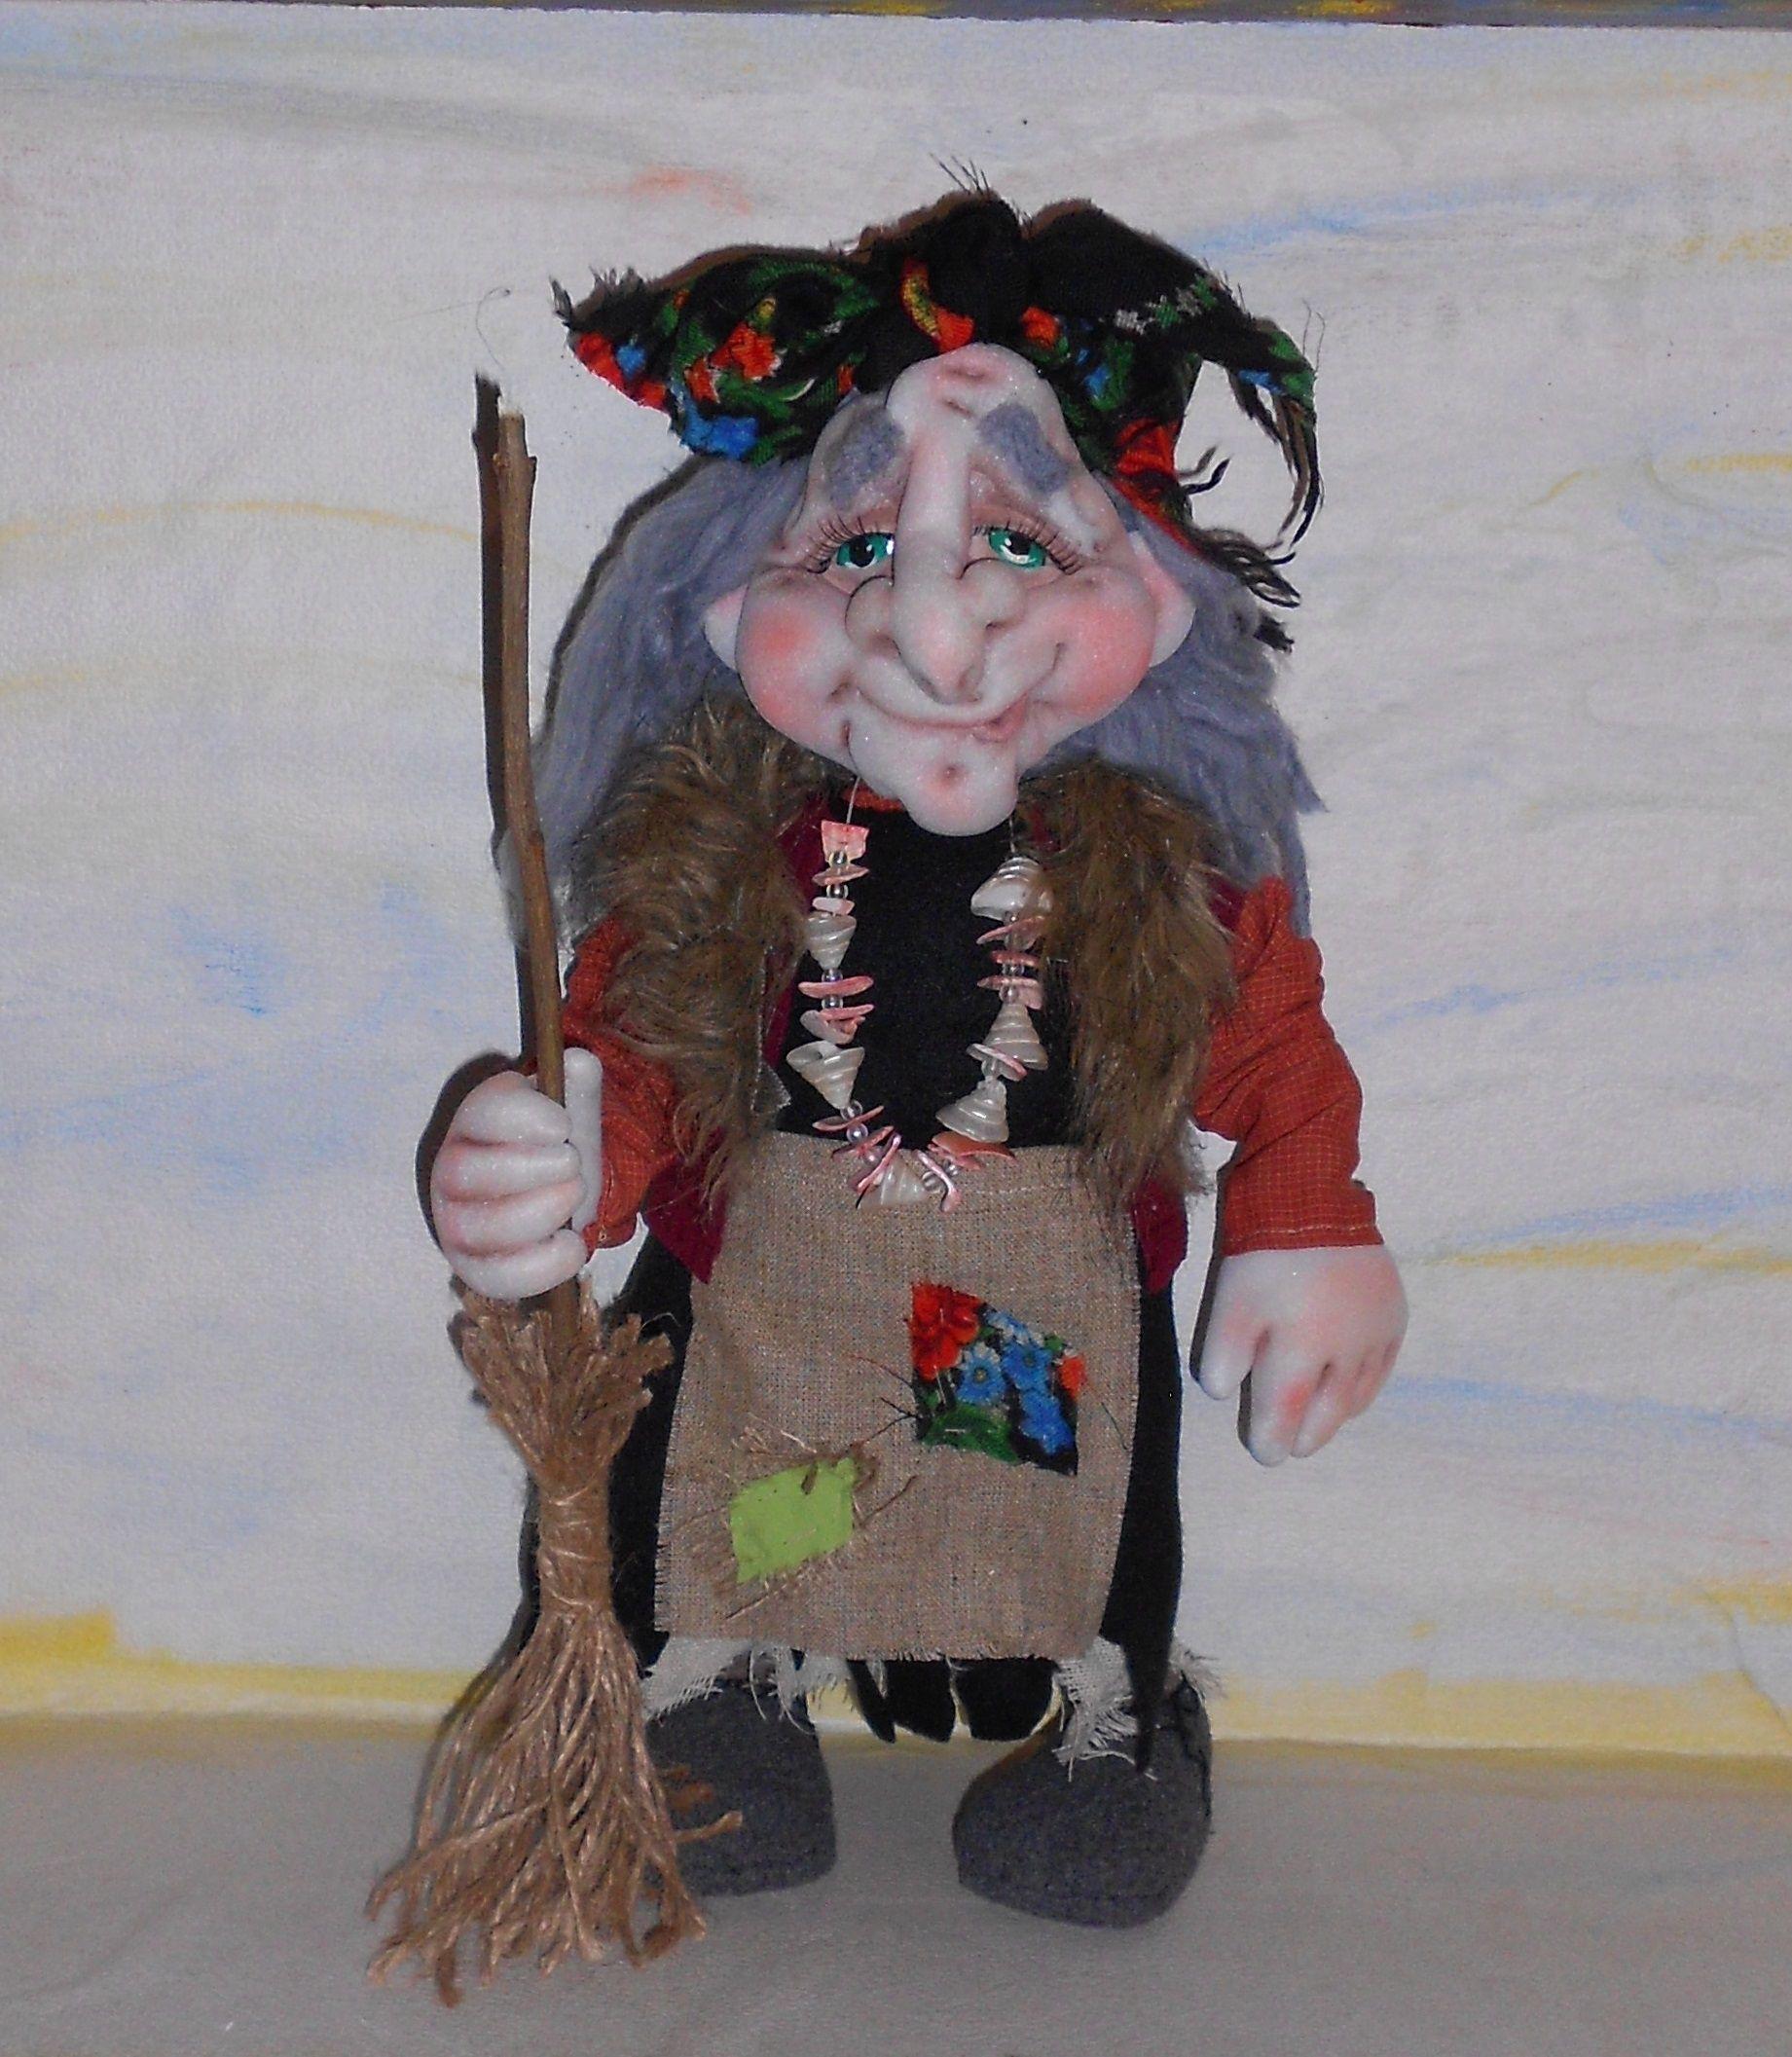 подарок кукла работа оберег техника ручная чулочная бабаяга бабкаежка